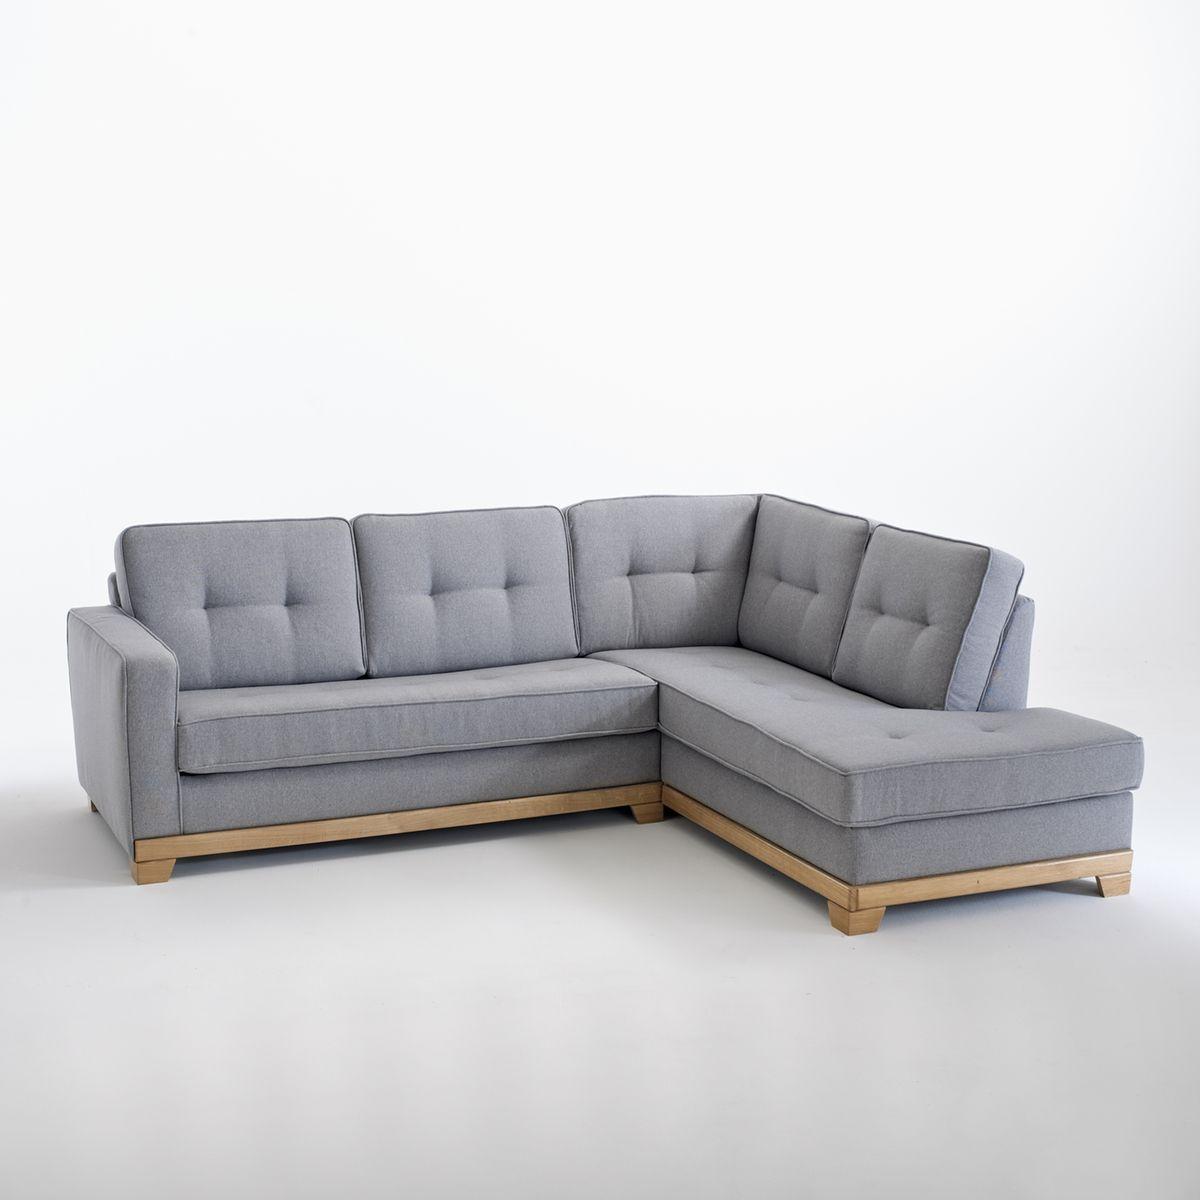 Canapé d'angle convertible chiné Excellence bultex